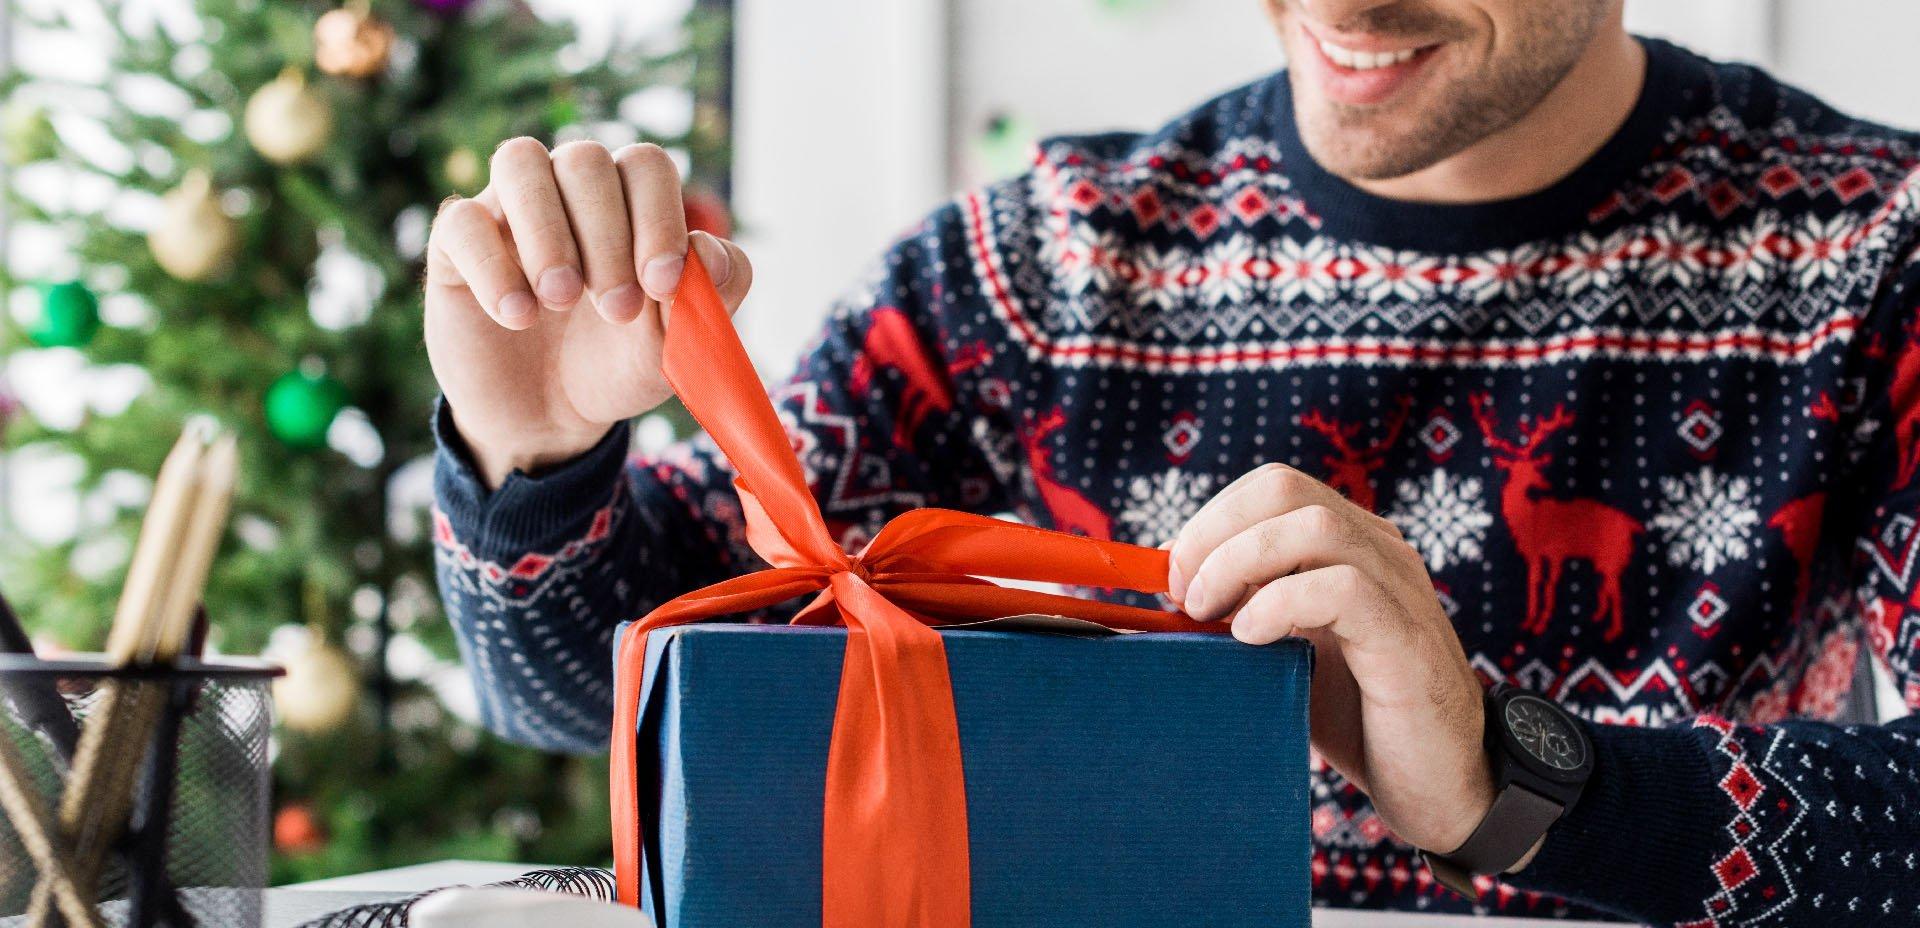 regali di Natale per uomo: Verdesativa